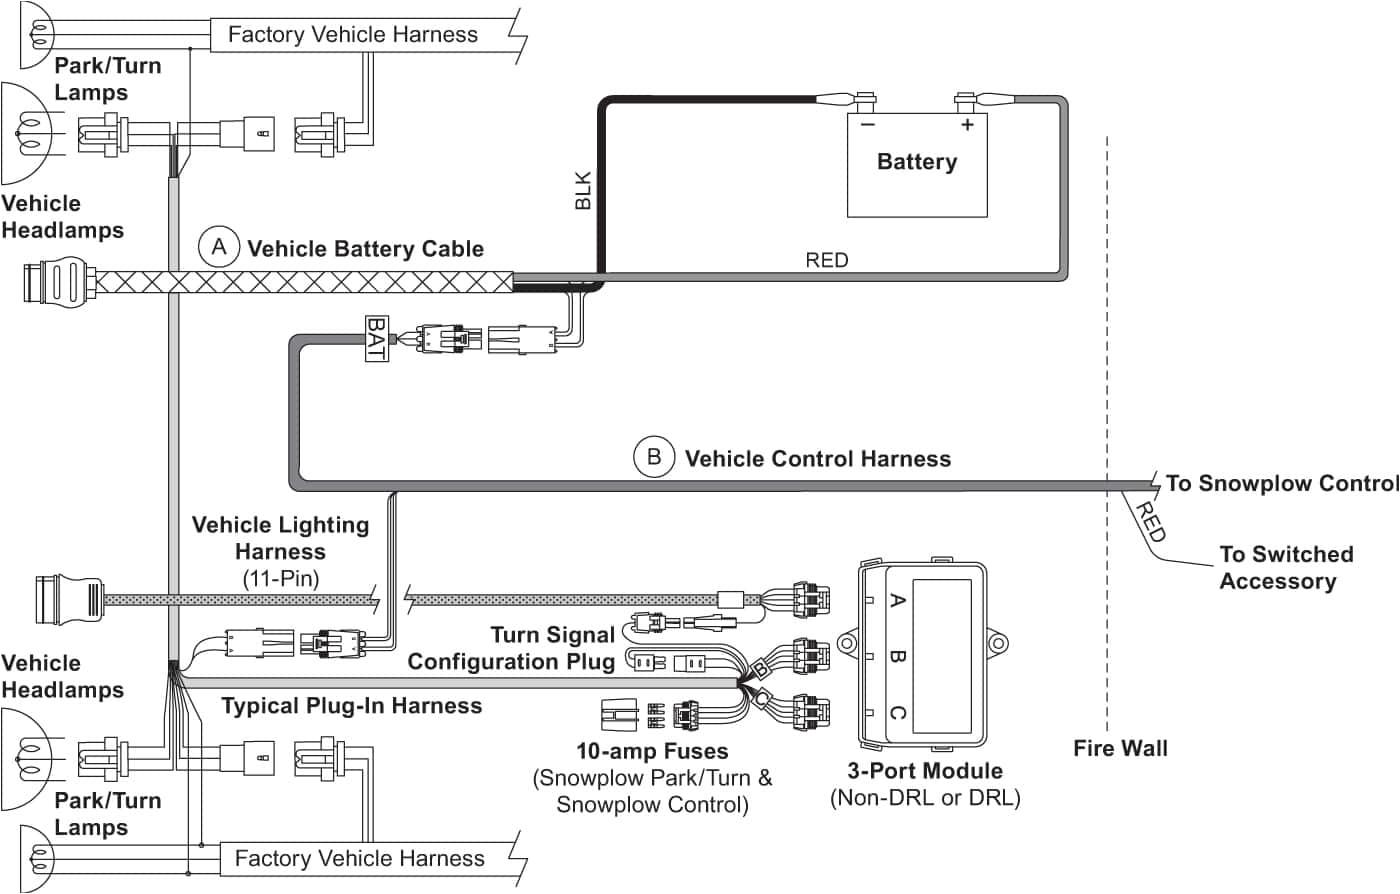 wiring diagram on fisher xv2 plow wiring diagram rowsprintable fisher plow u0026 spreader specs